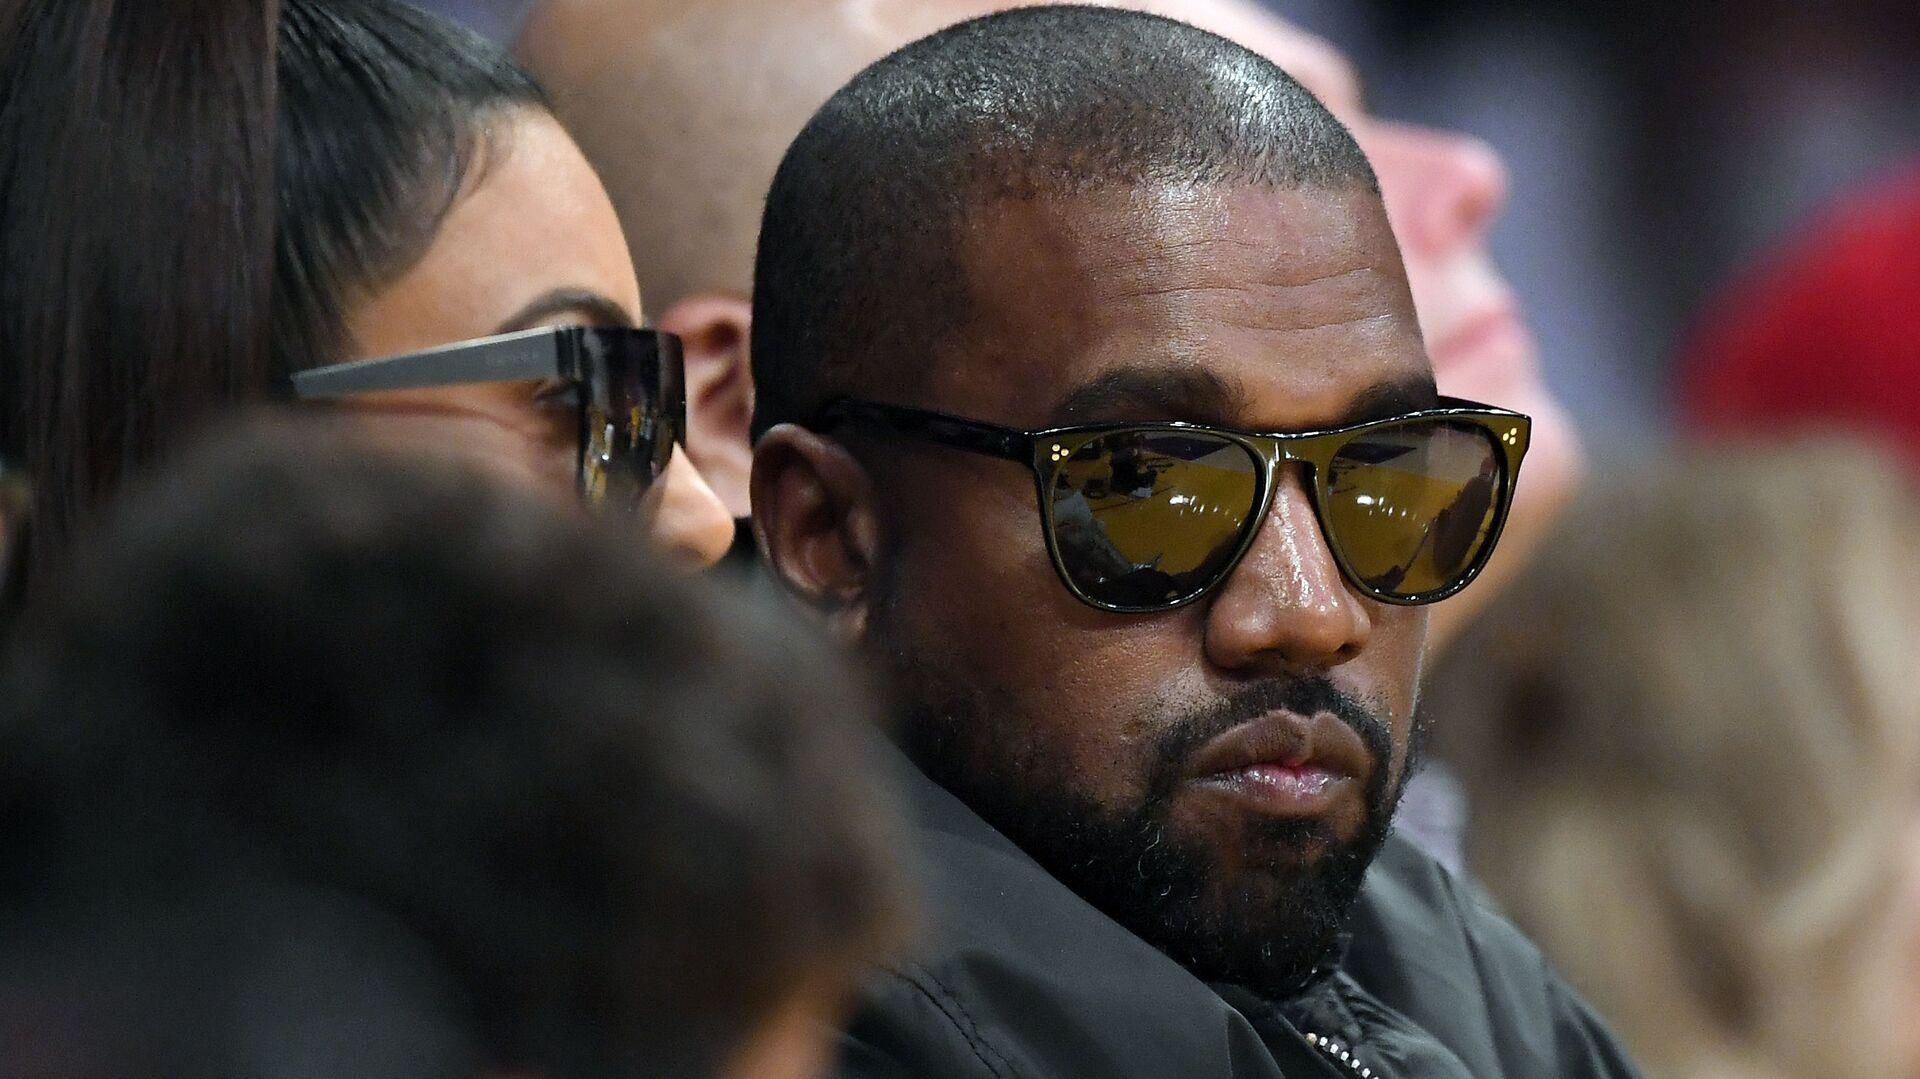 Kim Kardashian e il rapper Kanye West - Sputnik Italia, 1920, 25.08.2021